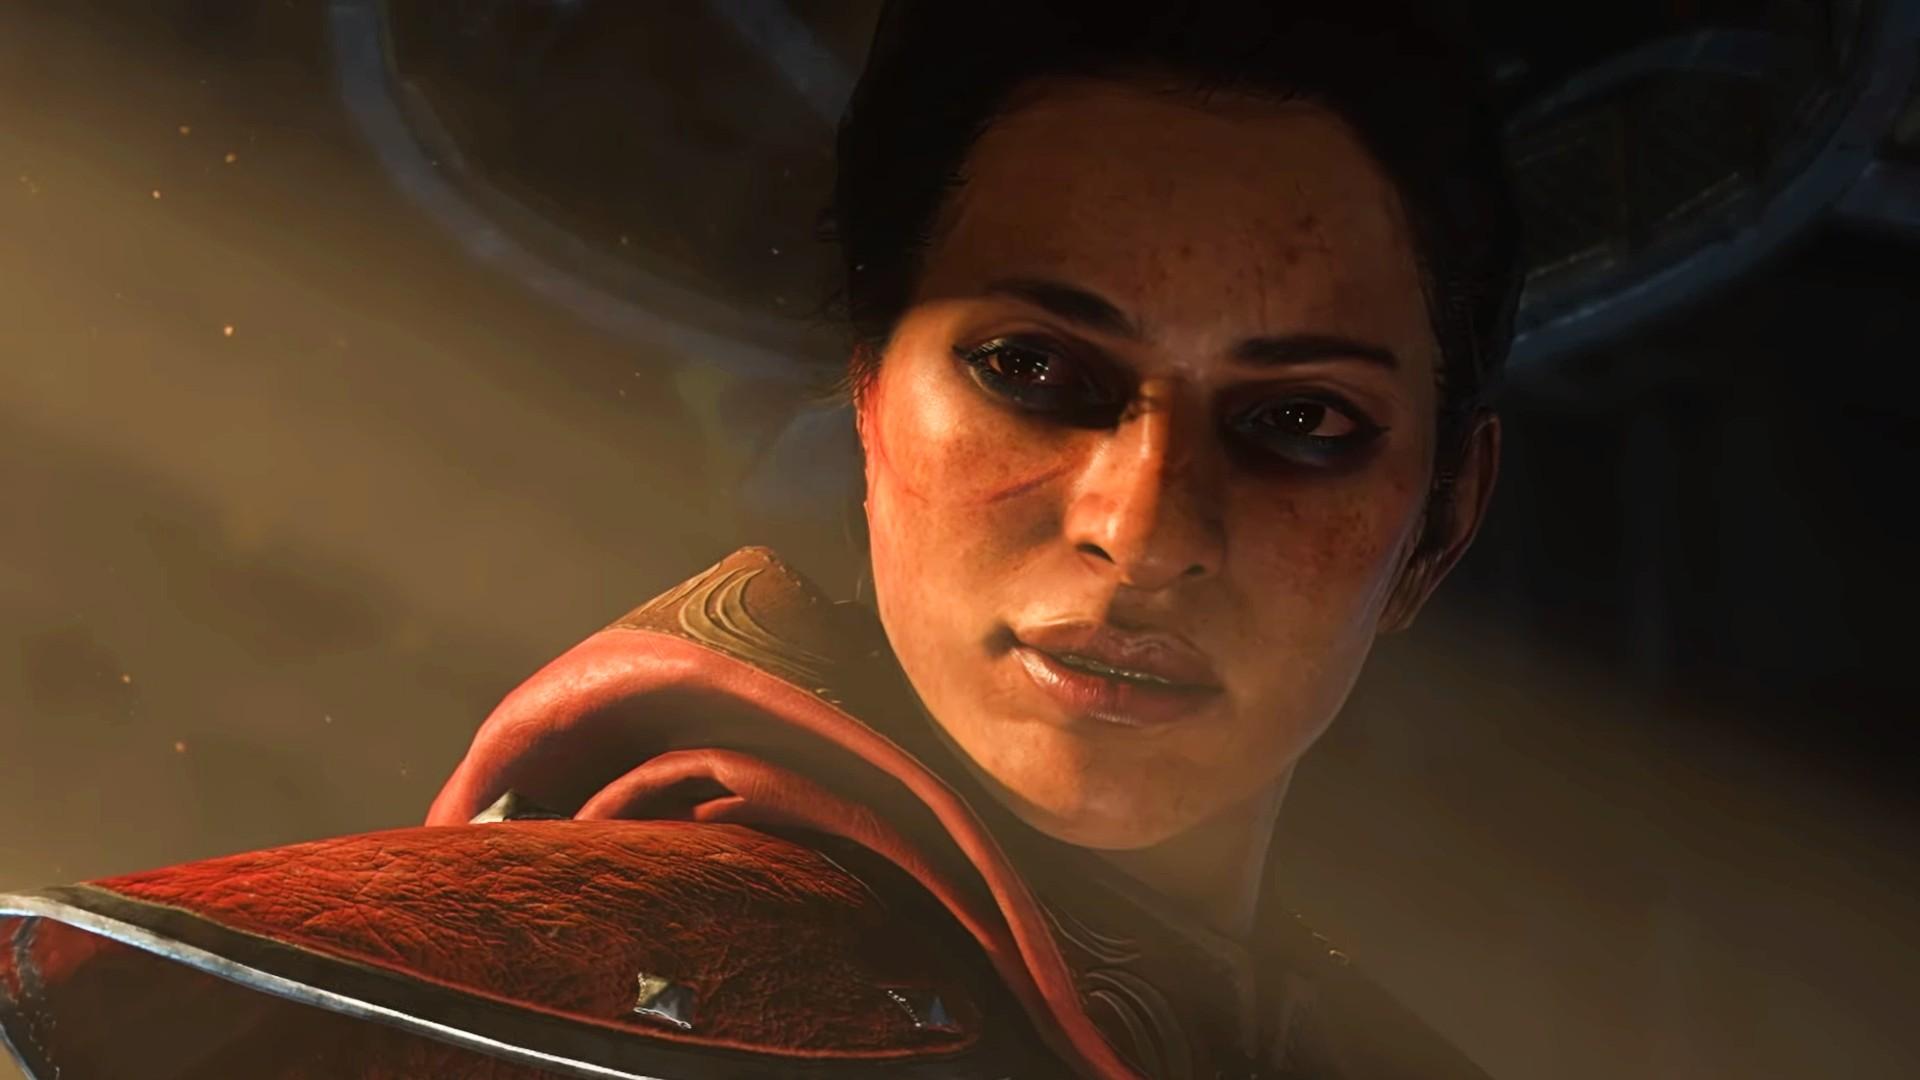 Diablo 4's Rogue class revealed in wonderfully gory trailer